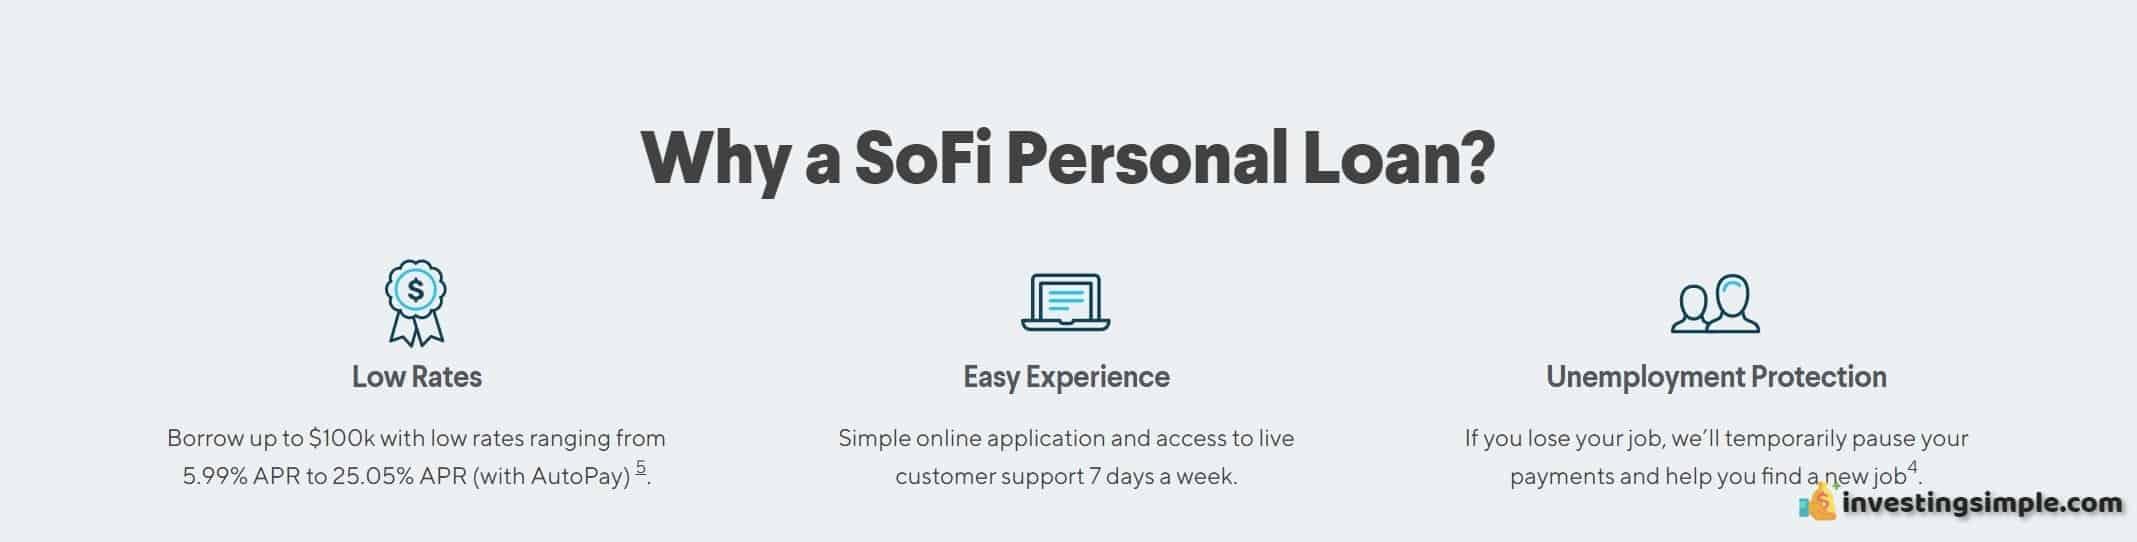 sofi personal loan